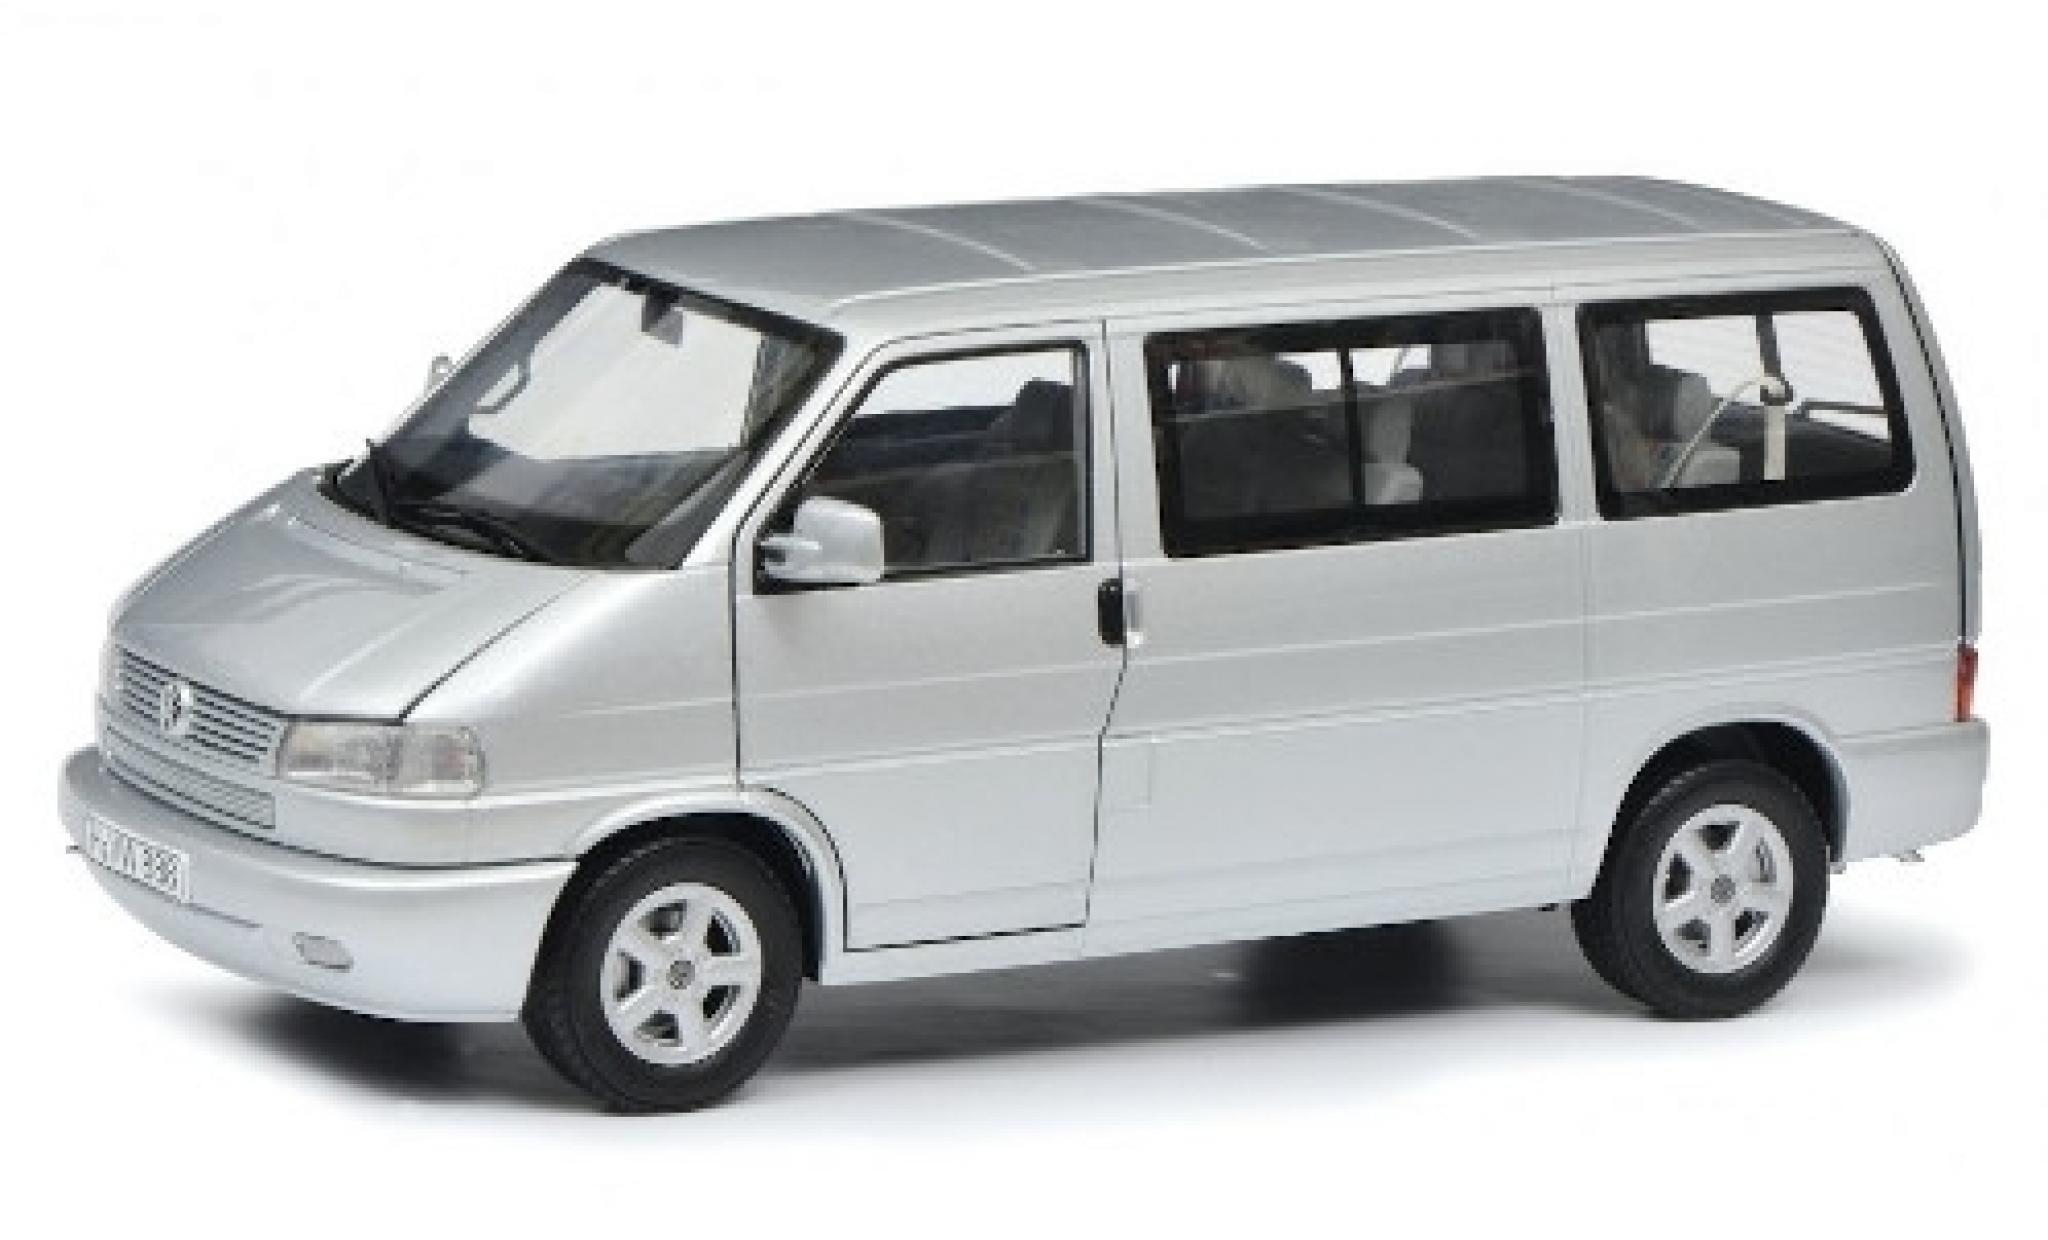 Volkswagen T4 1/18 Schuco b Caravelle grise